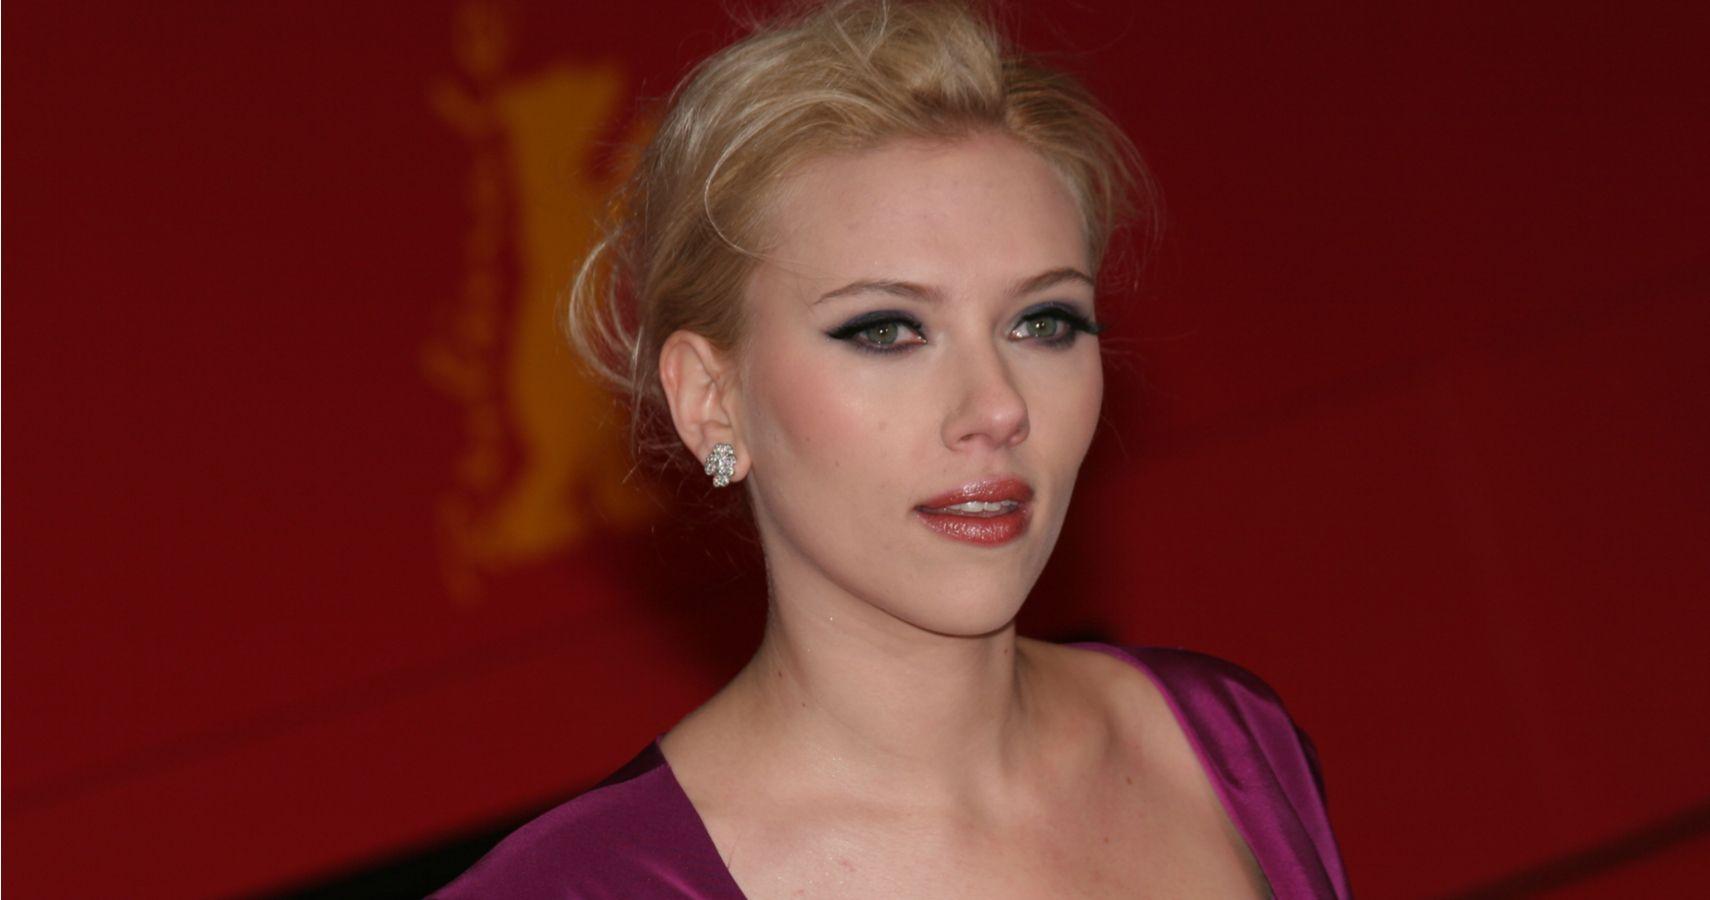 Fans Demand Scarlett Johansson Cancel Woody Allen The Way NBC Cancelled The Golden Globes